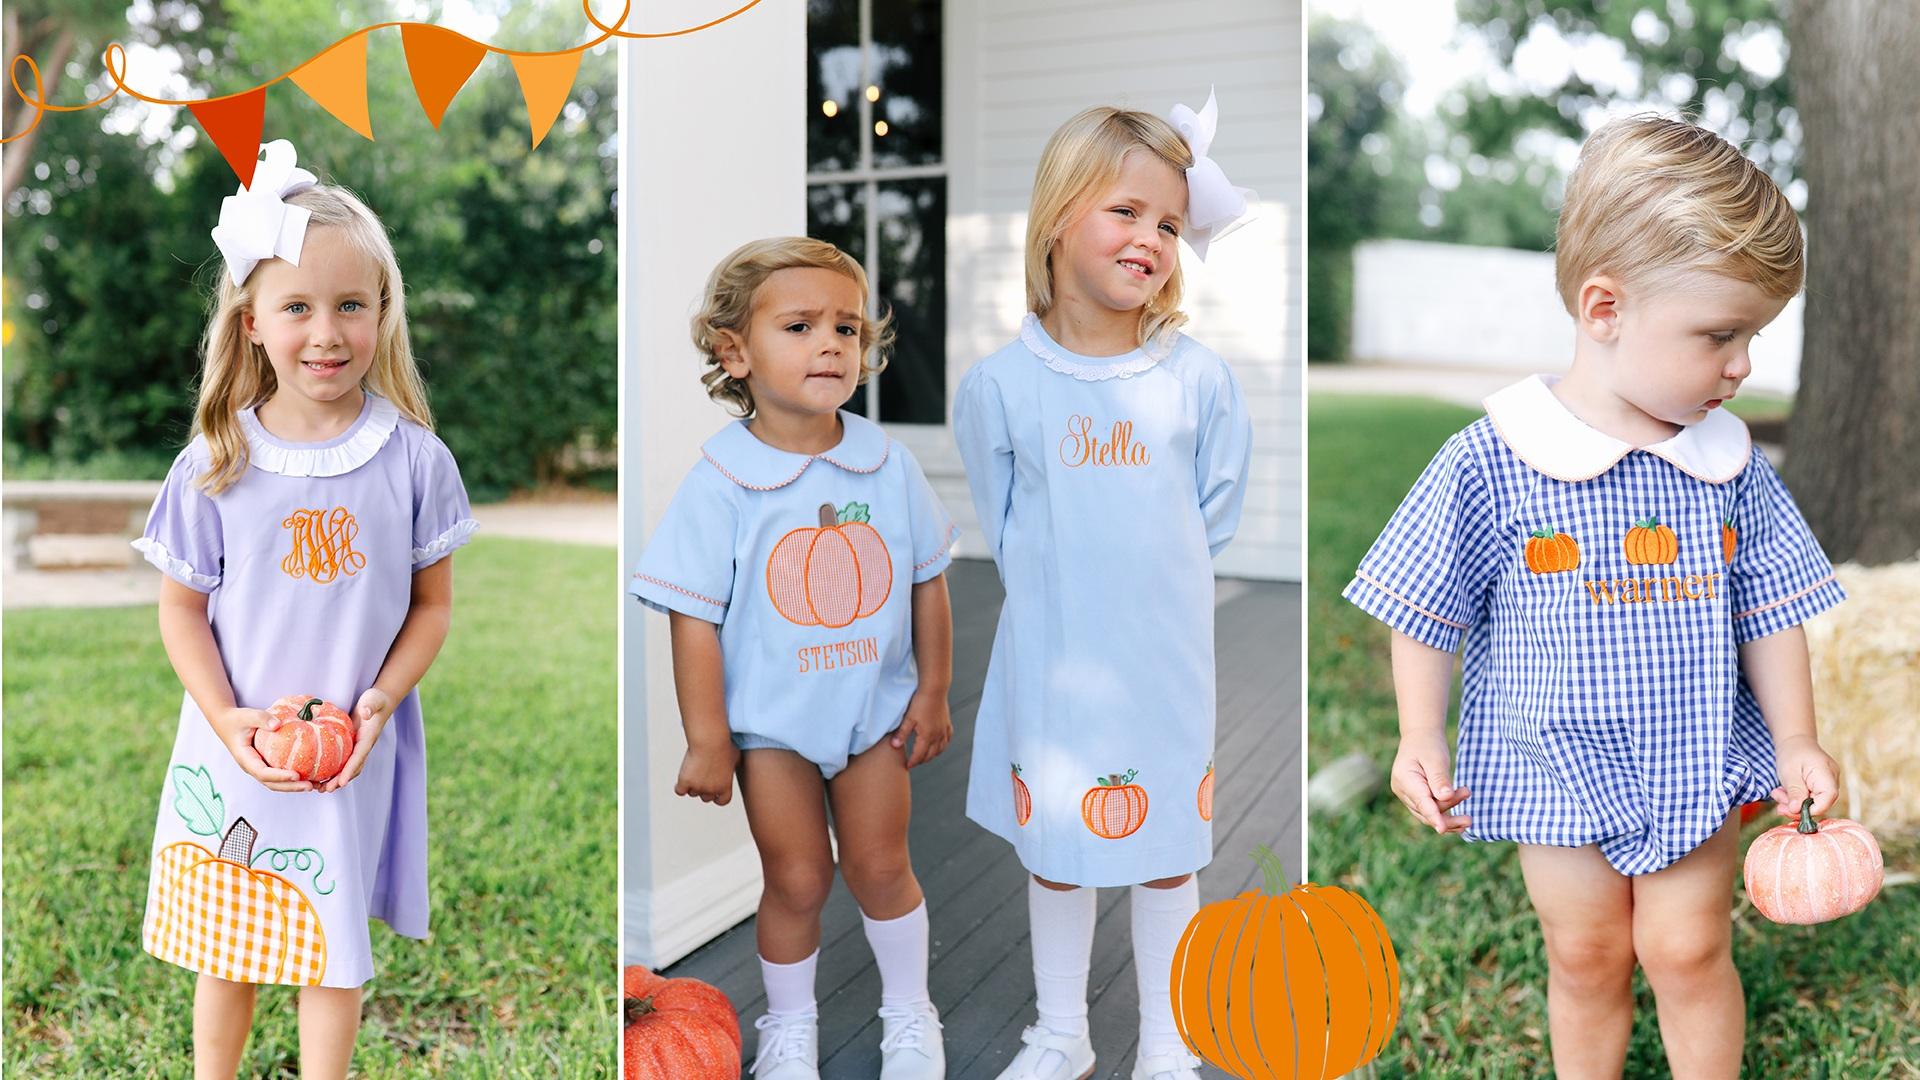 Childrens Pumpkin Outfits